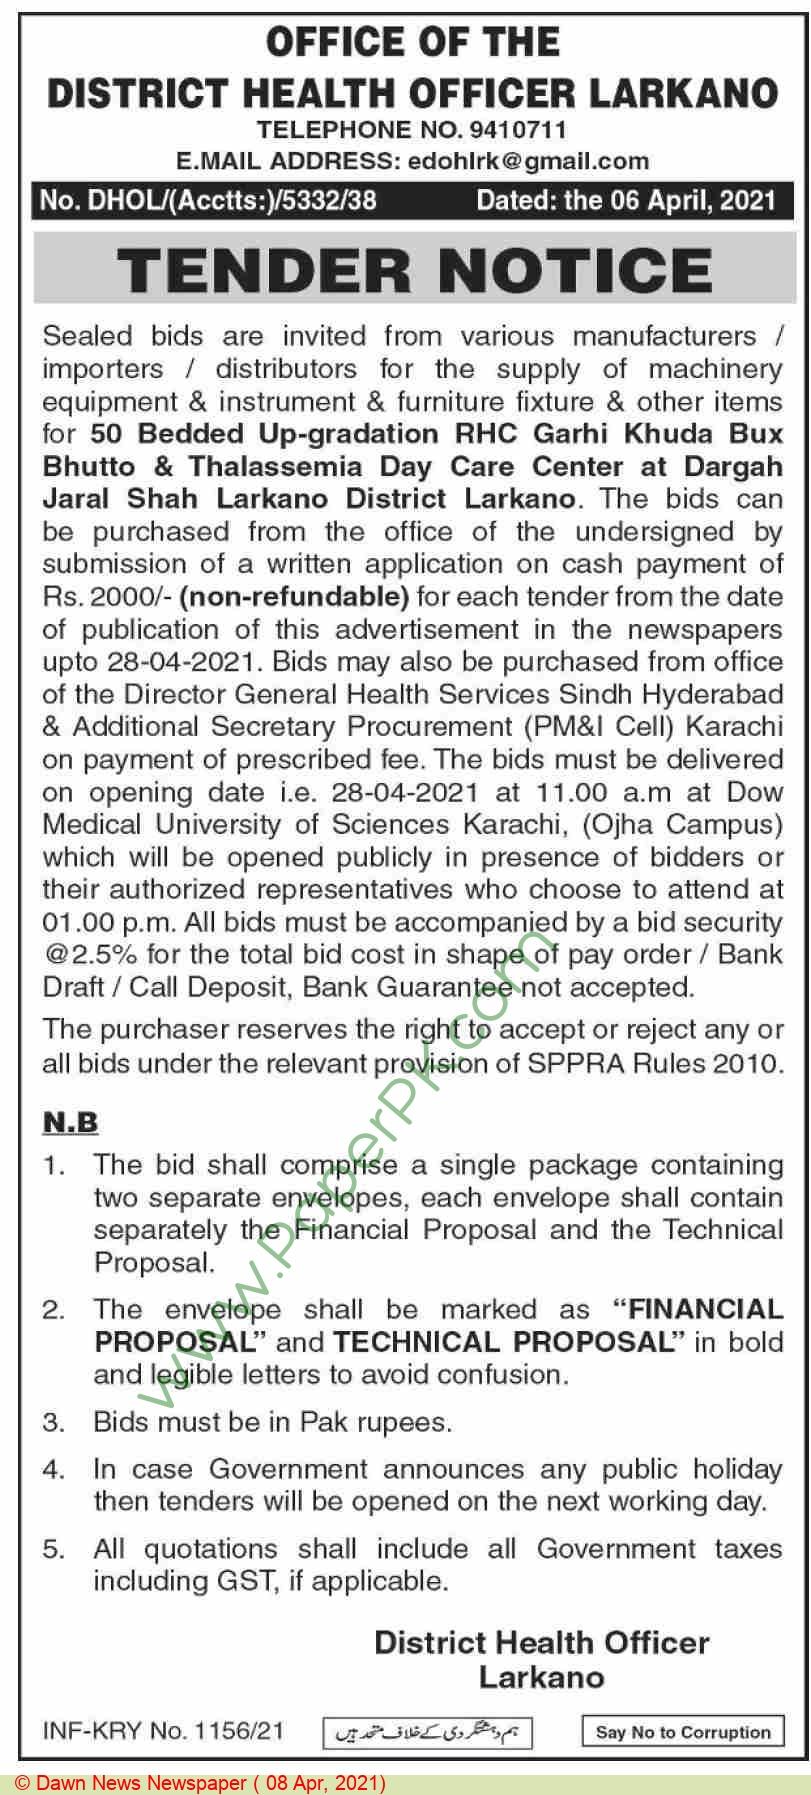 District Health Authority Larkana Tender Notice